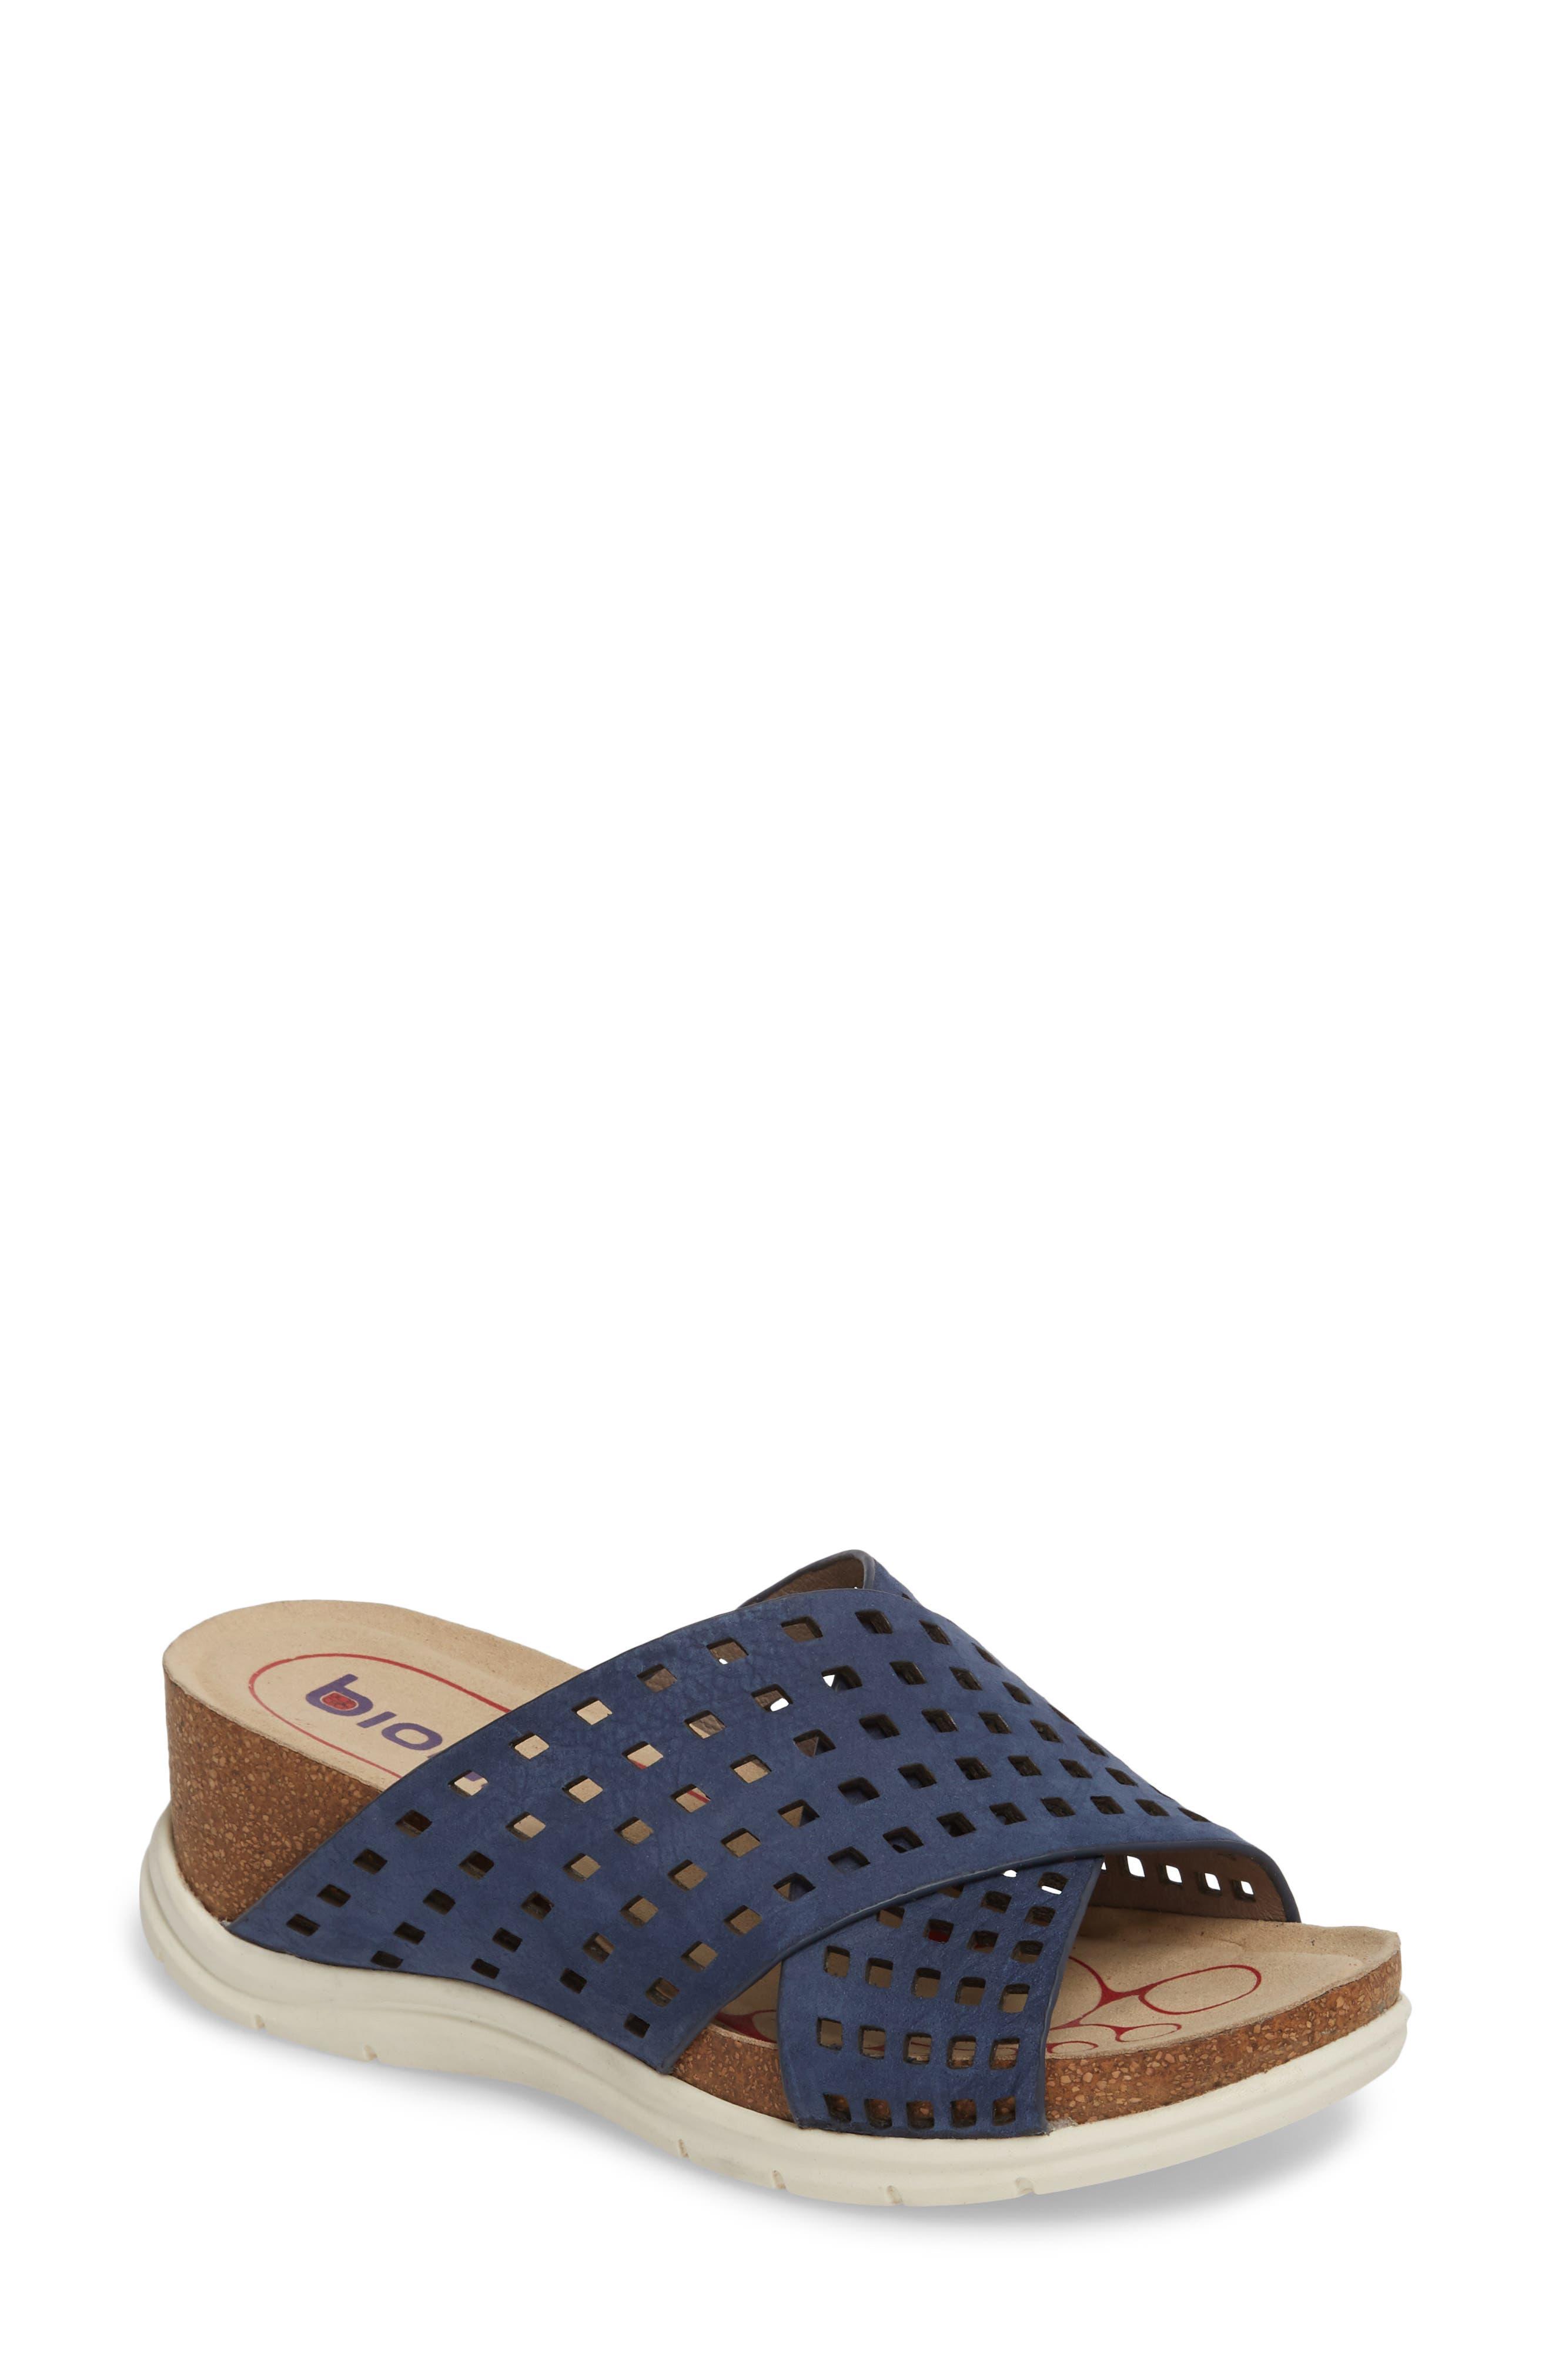 BIONICA Pandora Slide Sandal, Main, color, NAVY LEATHER